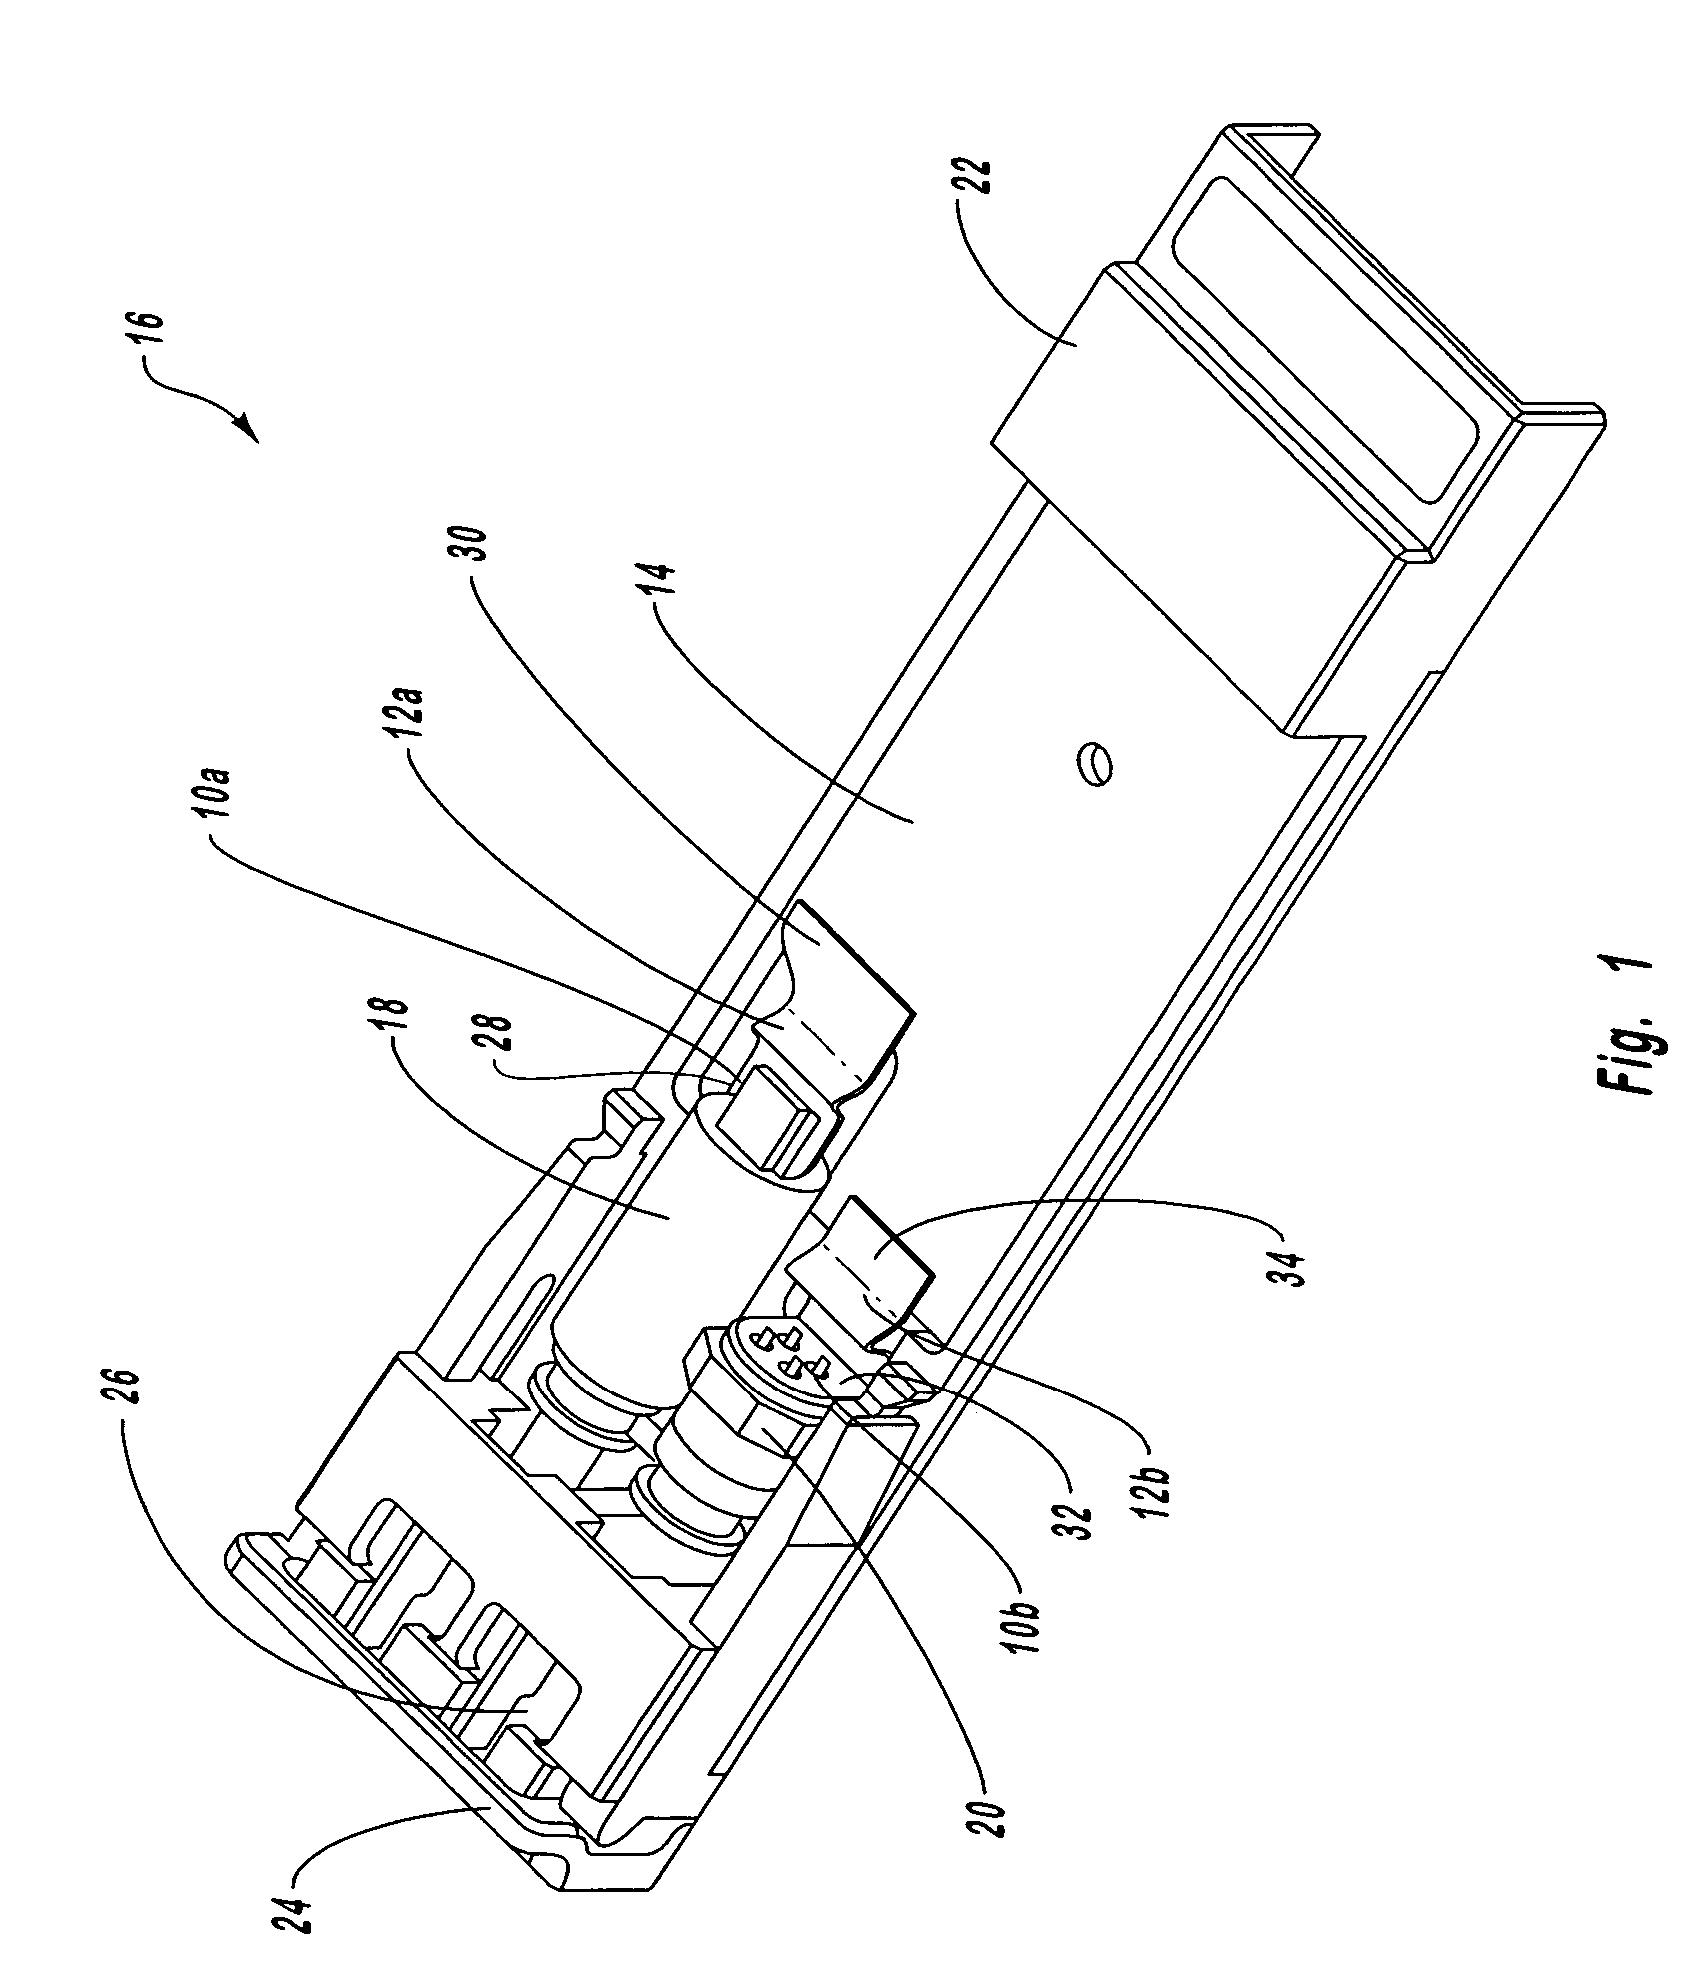 patent us7629537 - single layer flex circuit